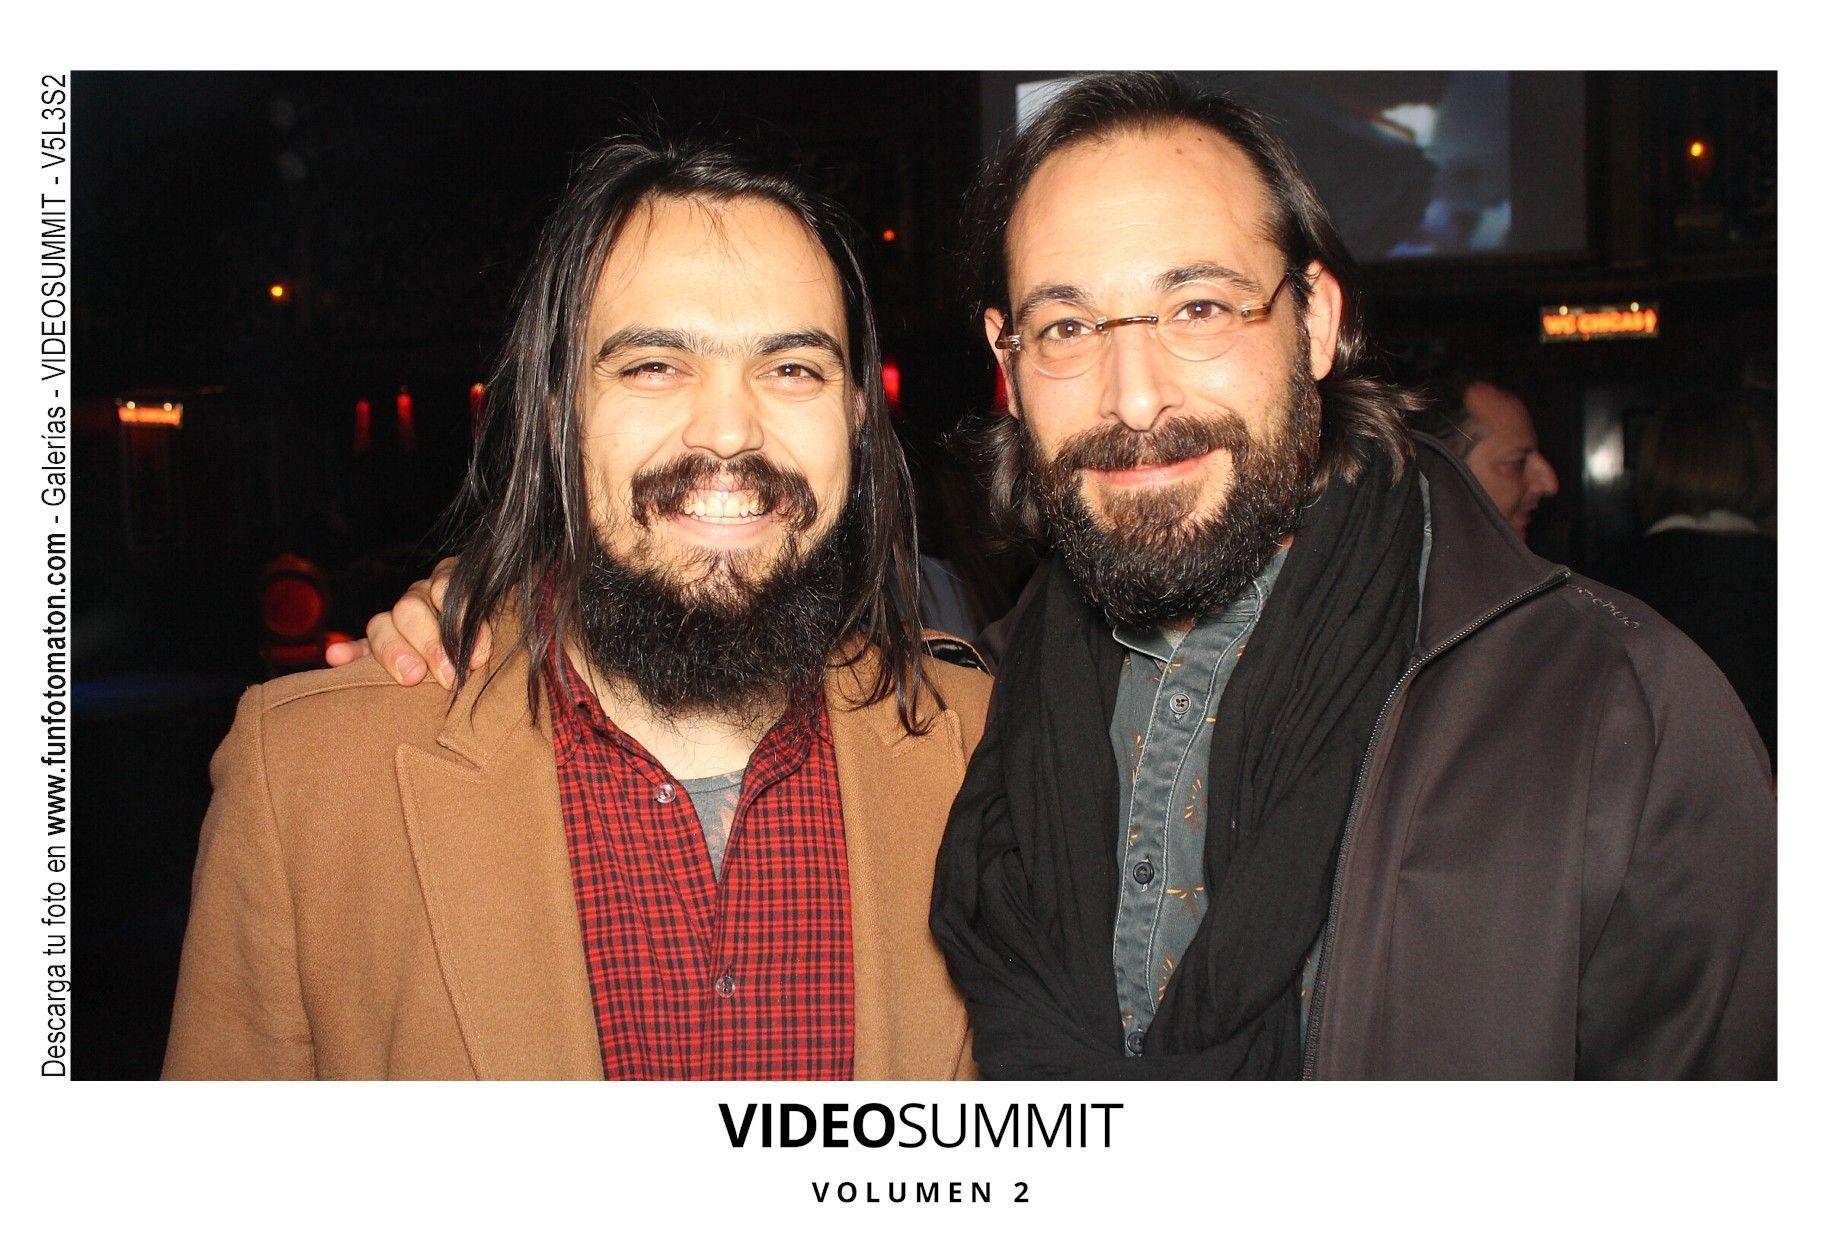 videosummit-vol2-club-party-005